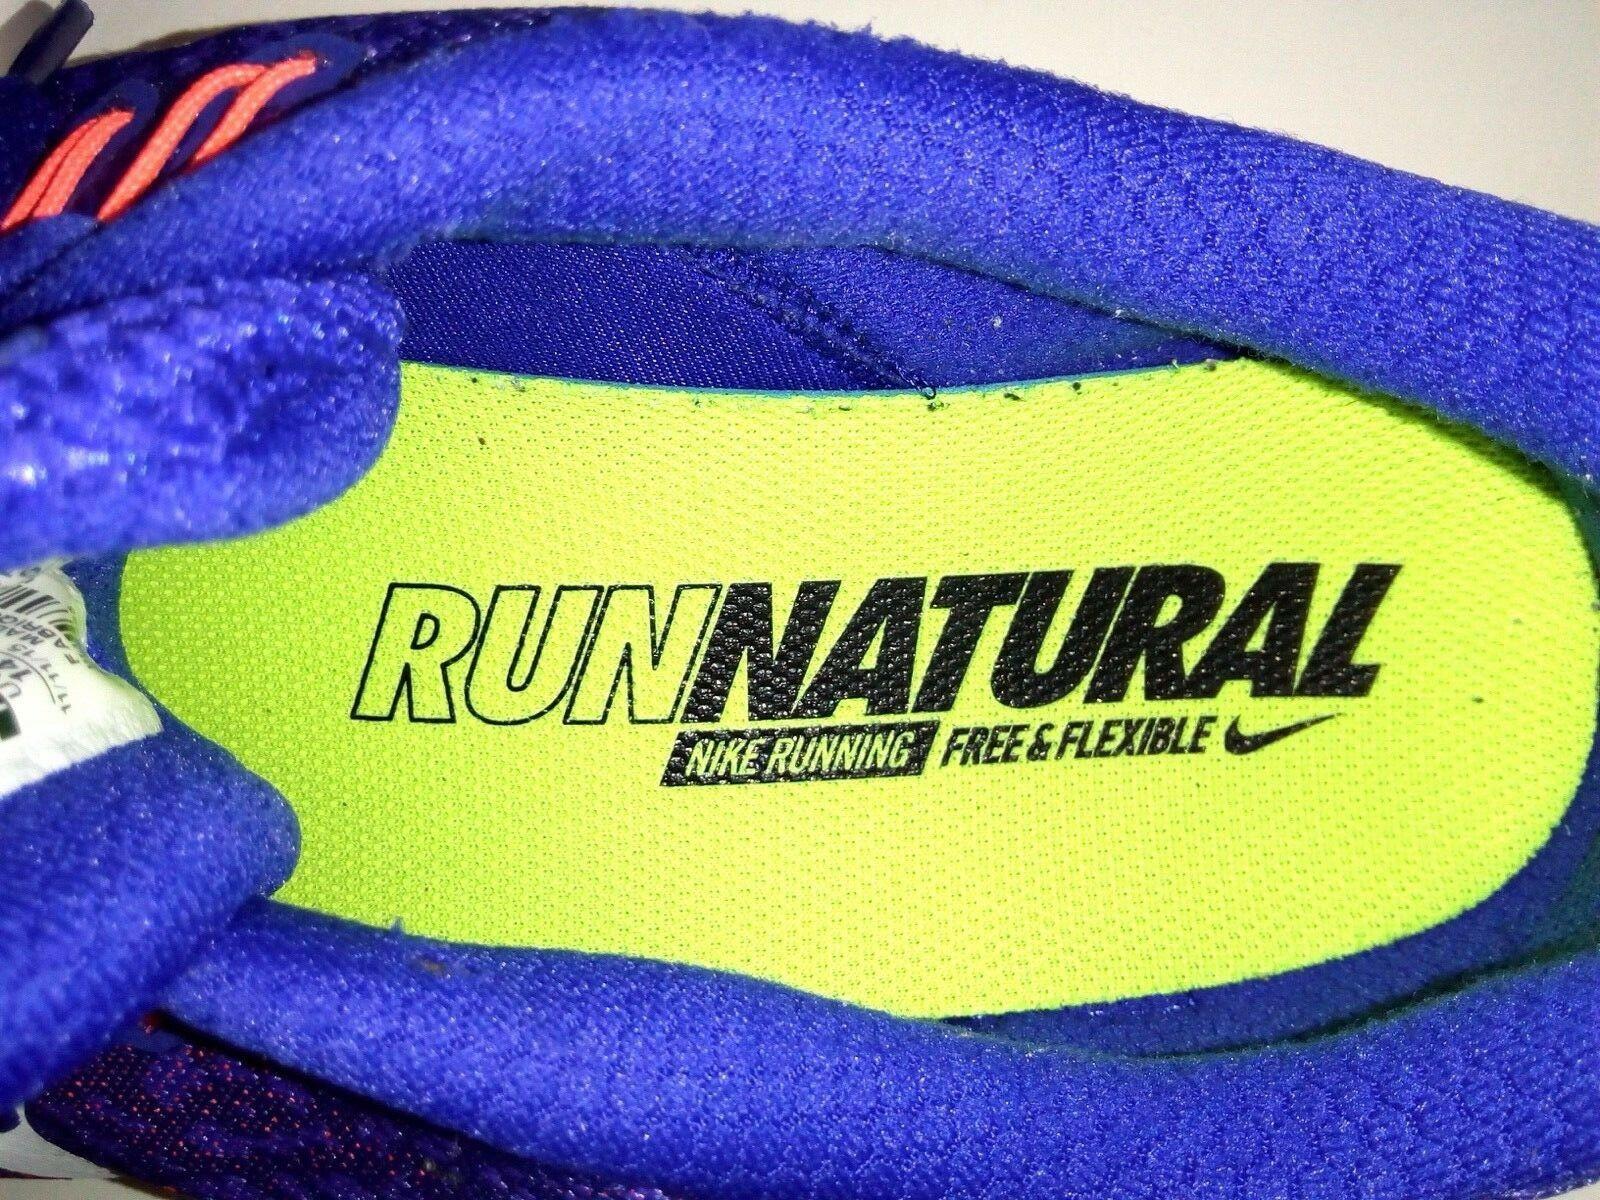 Nike Free RN Distance Mens Sneakers 14 Blue/Orange Run Athletic Shoes 827115 402